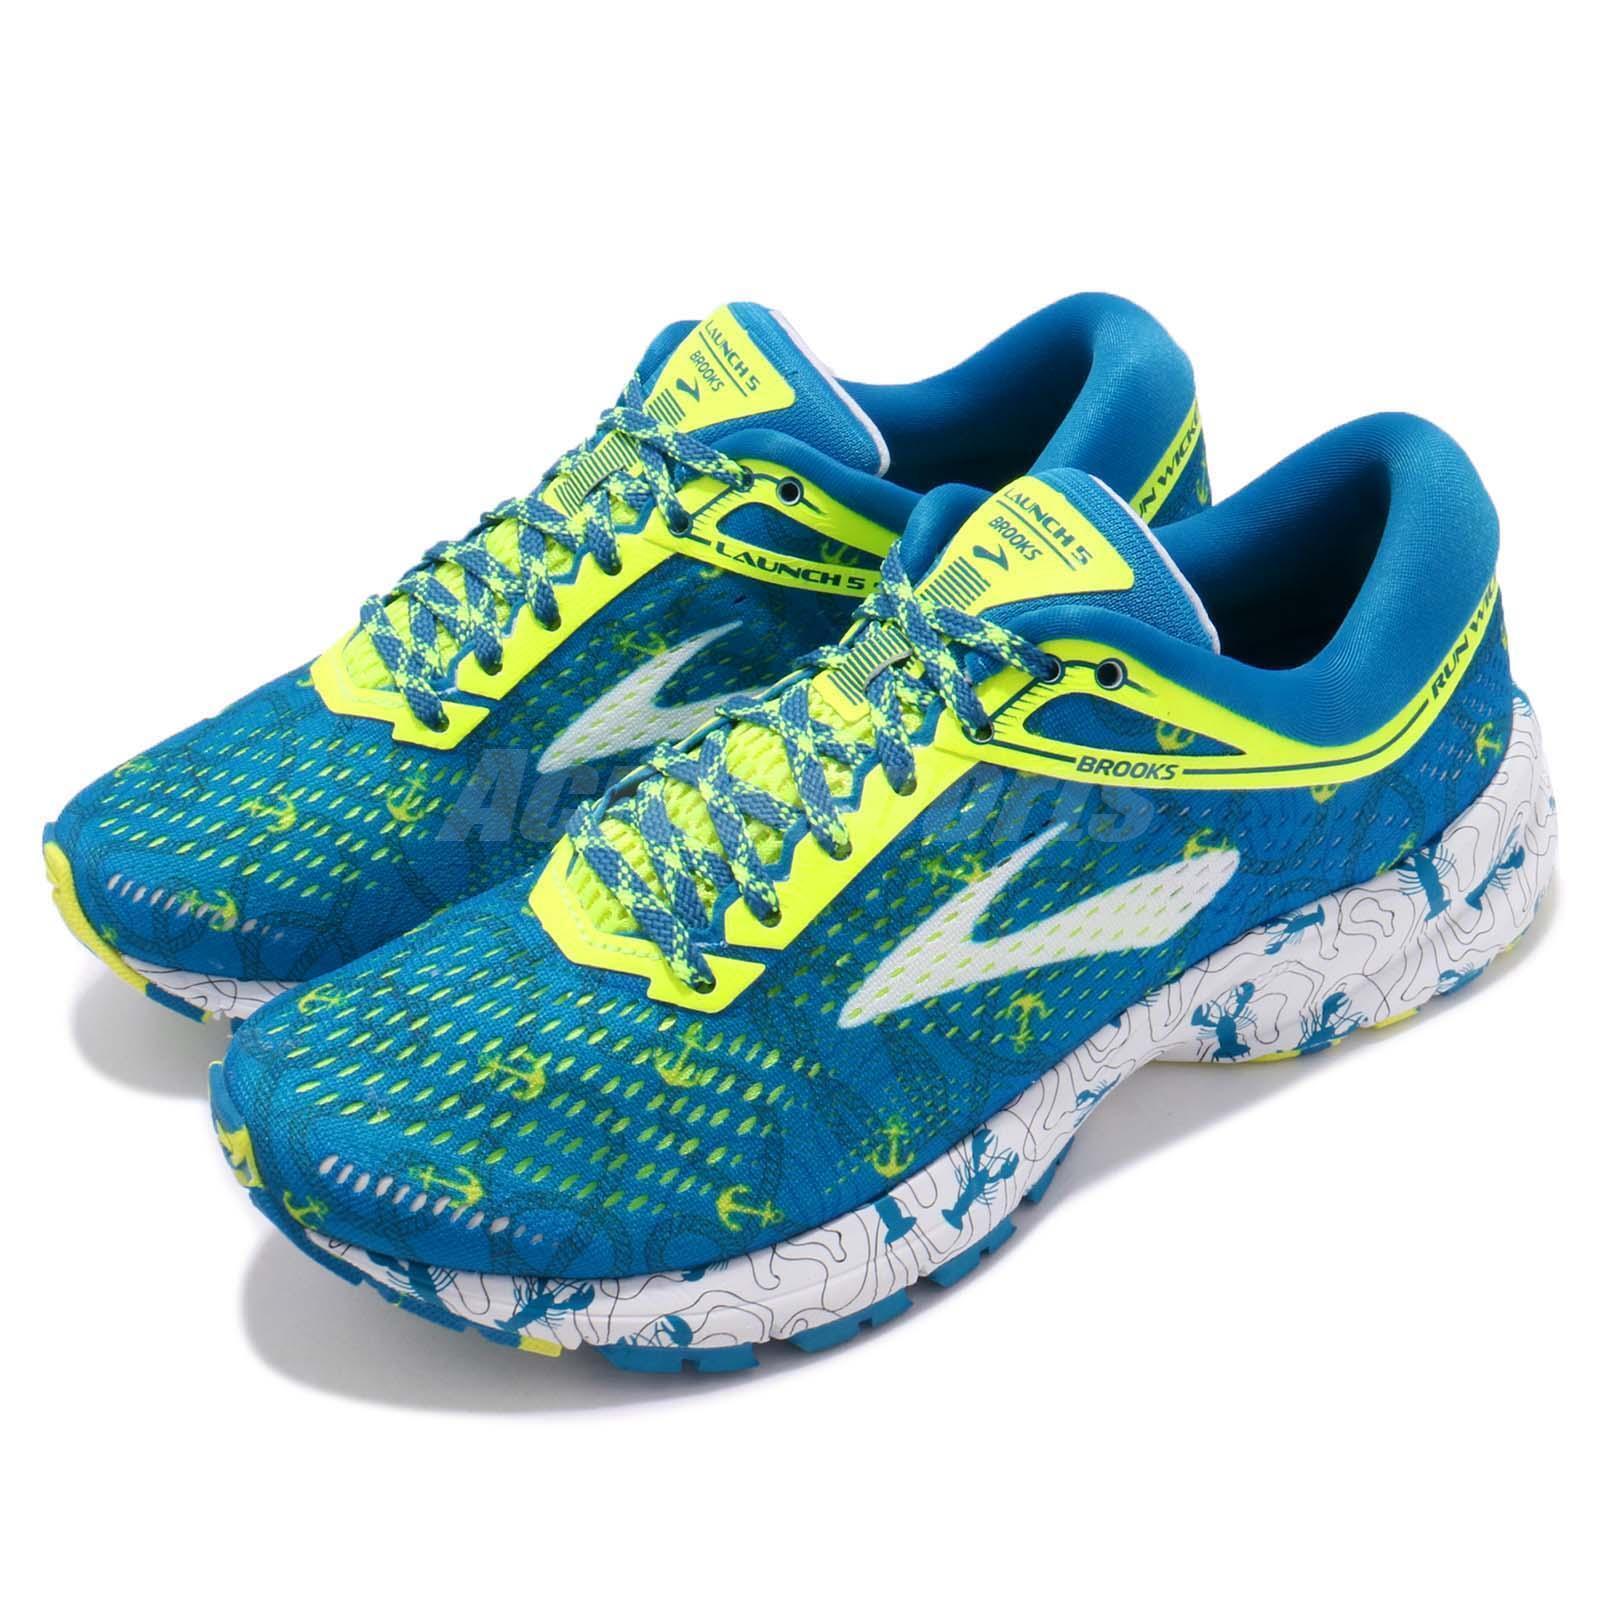 Brooks Launch 5  Boston Marathon Lobster bluee Volt Women Running shoes 120266 1B  save up to 50%